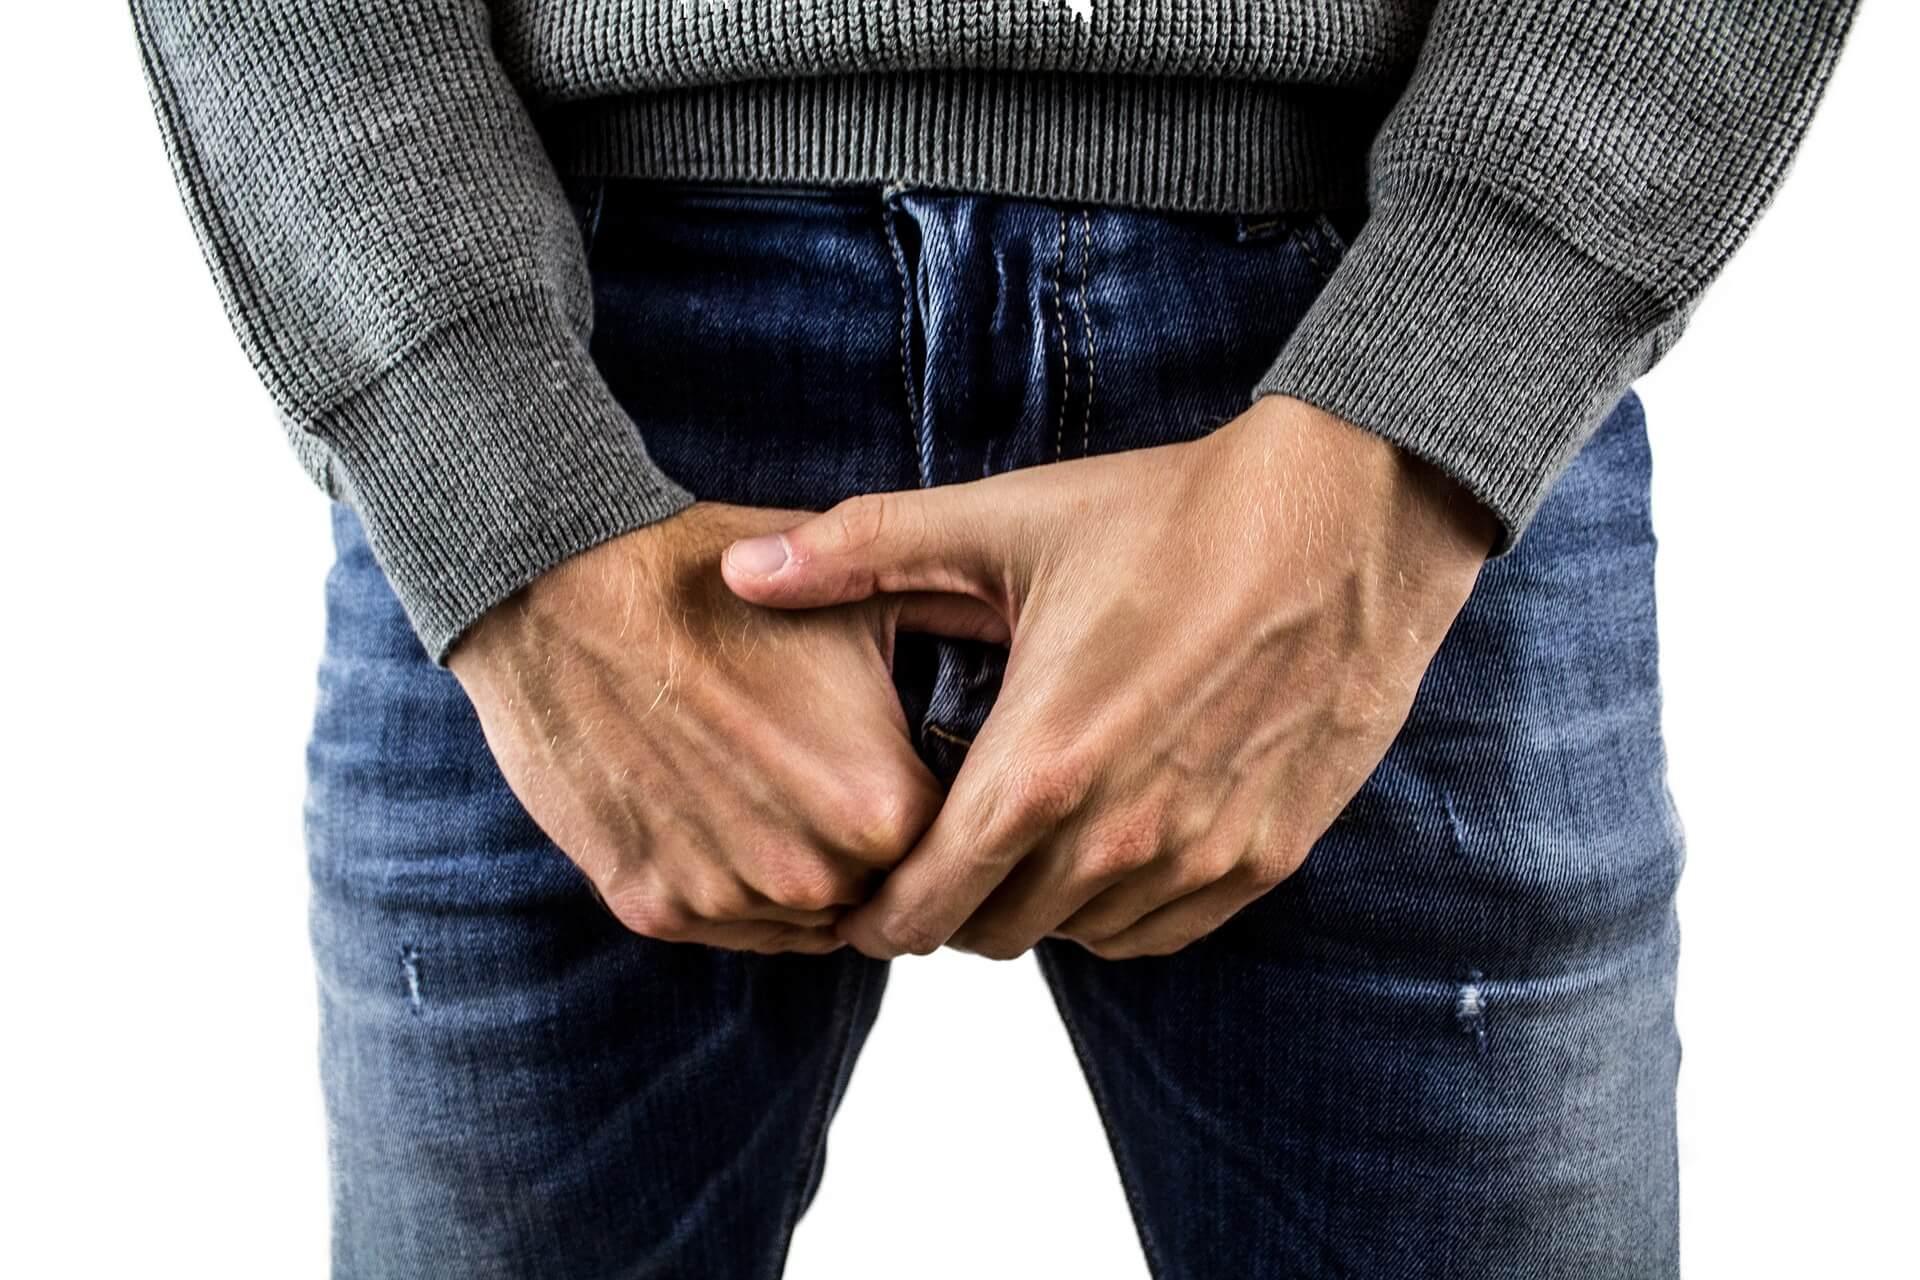 testicular pain image mens health warwickshire